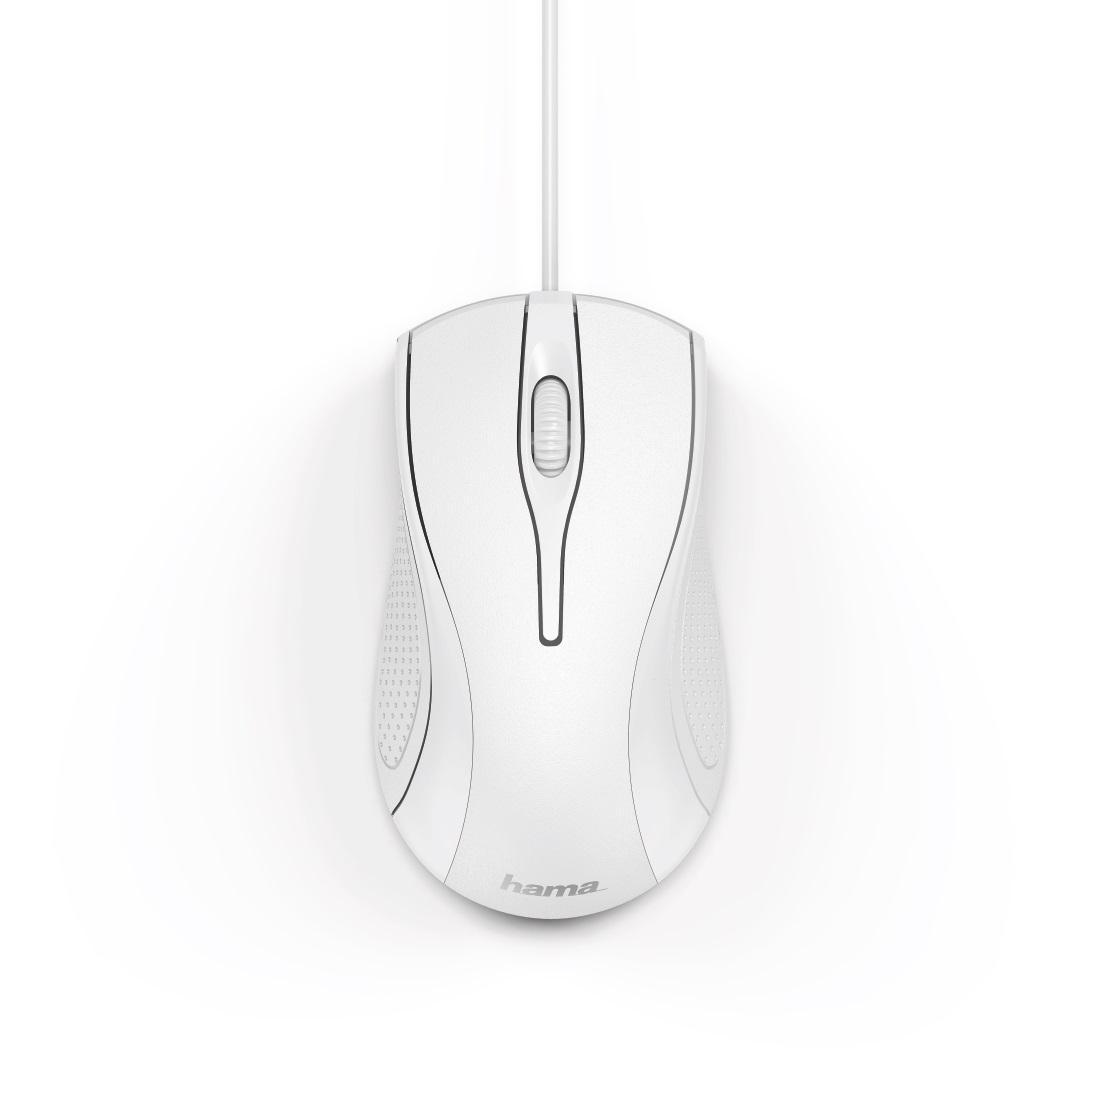 Оптична мишка HAMA MC-200, кабел 1.5 м, USB, 1200 dpi, 3 бутона, Бял-2